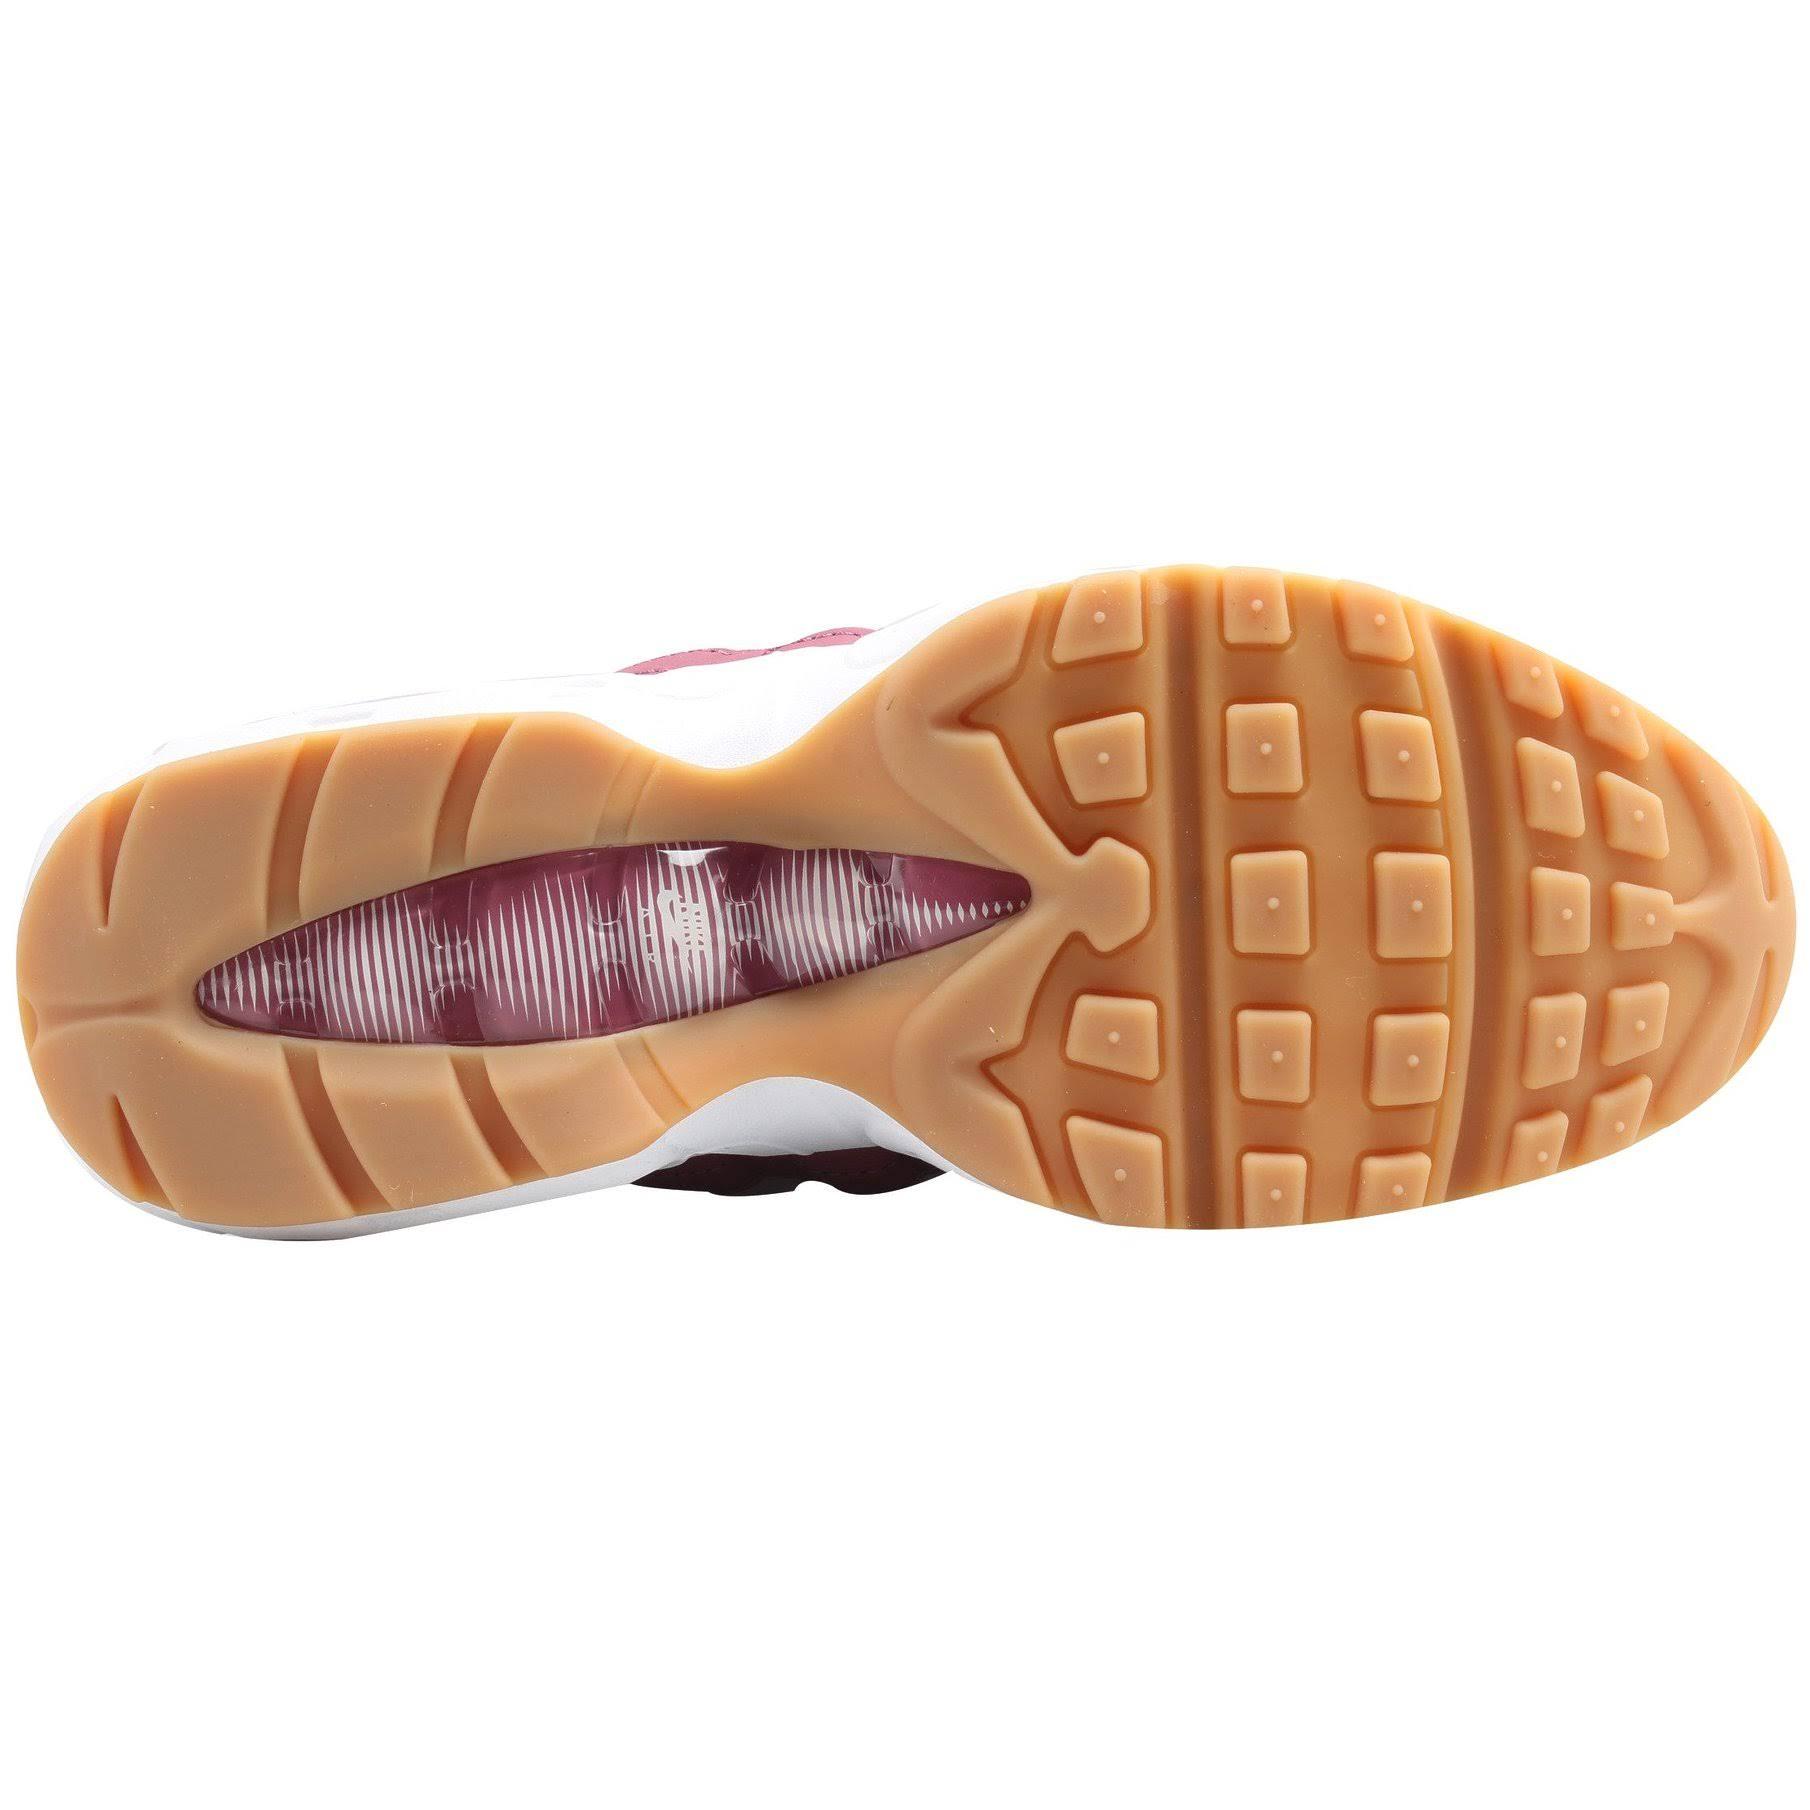 Barely Rose Mujer Tamaño 8 5 Max Nike Zapatos De Air 95 xq1gSYwa